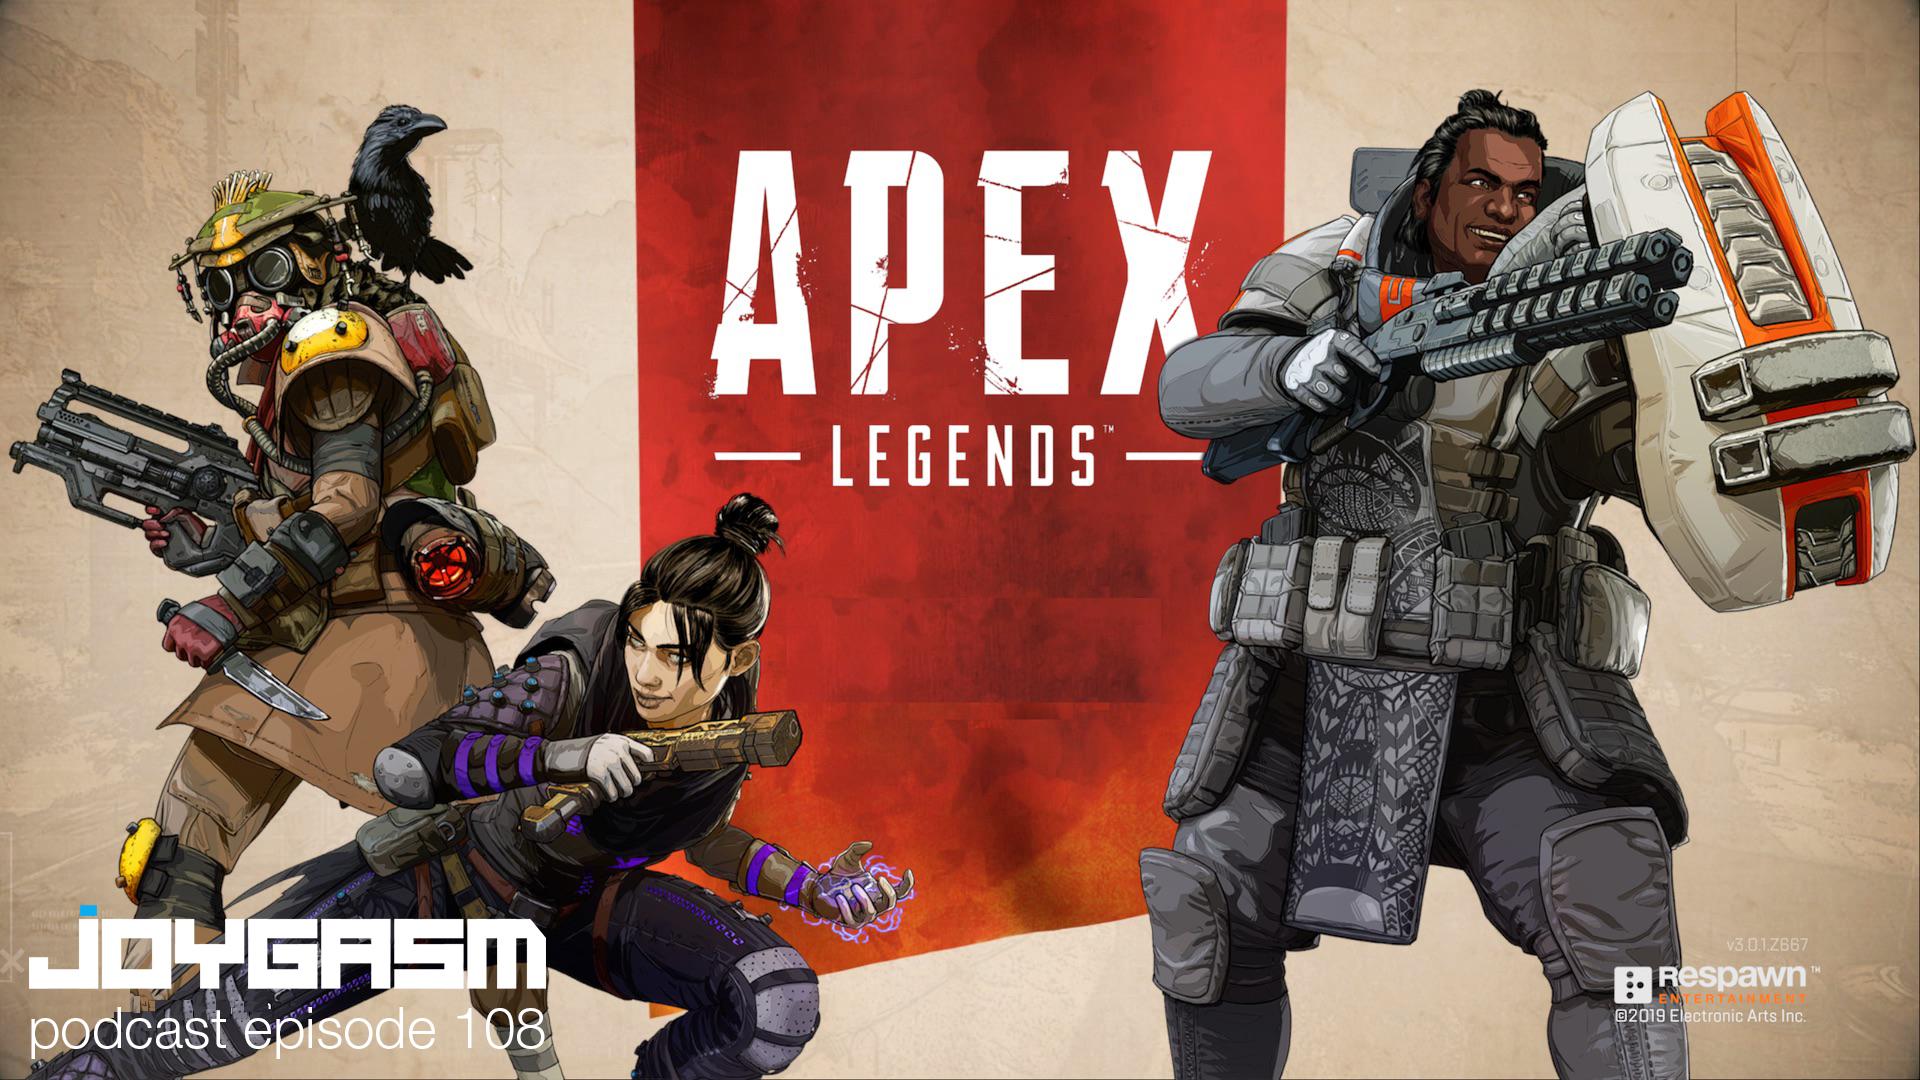 Ep. 108: Apex Legends Play Impressions